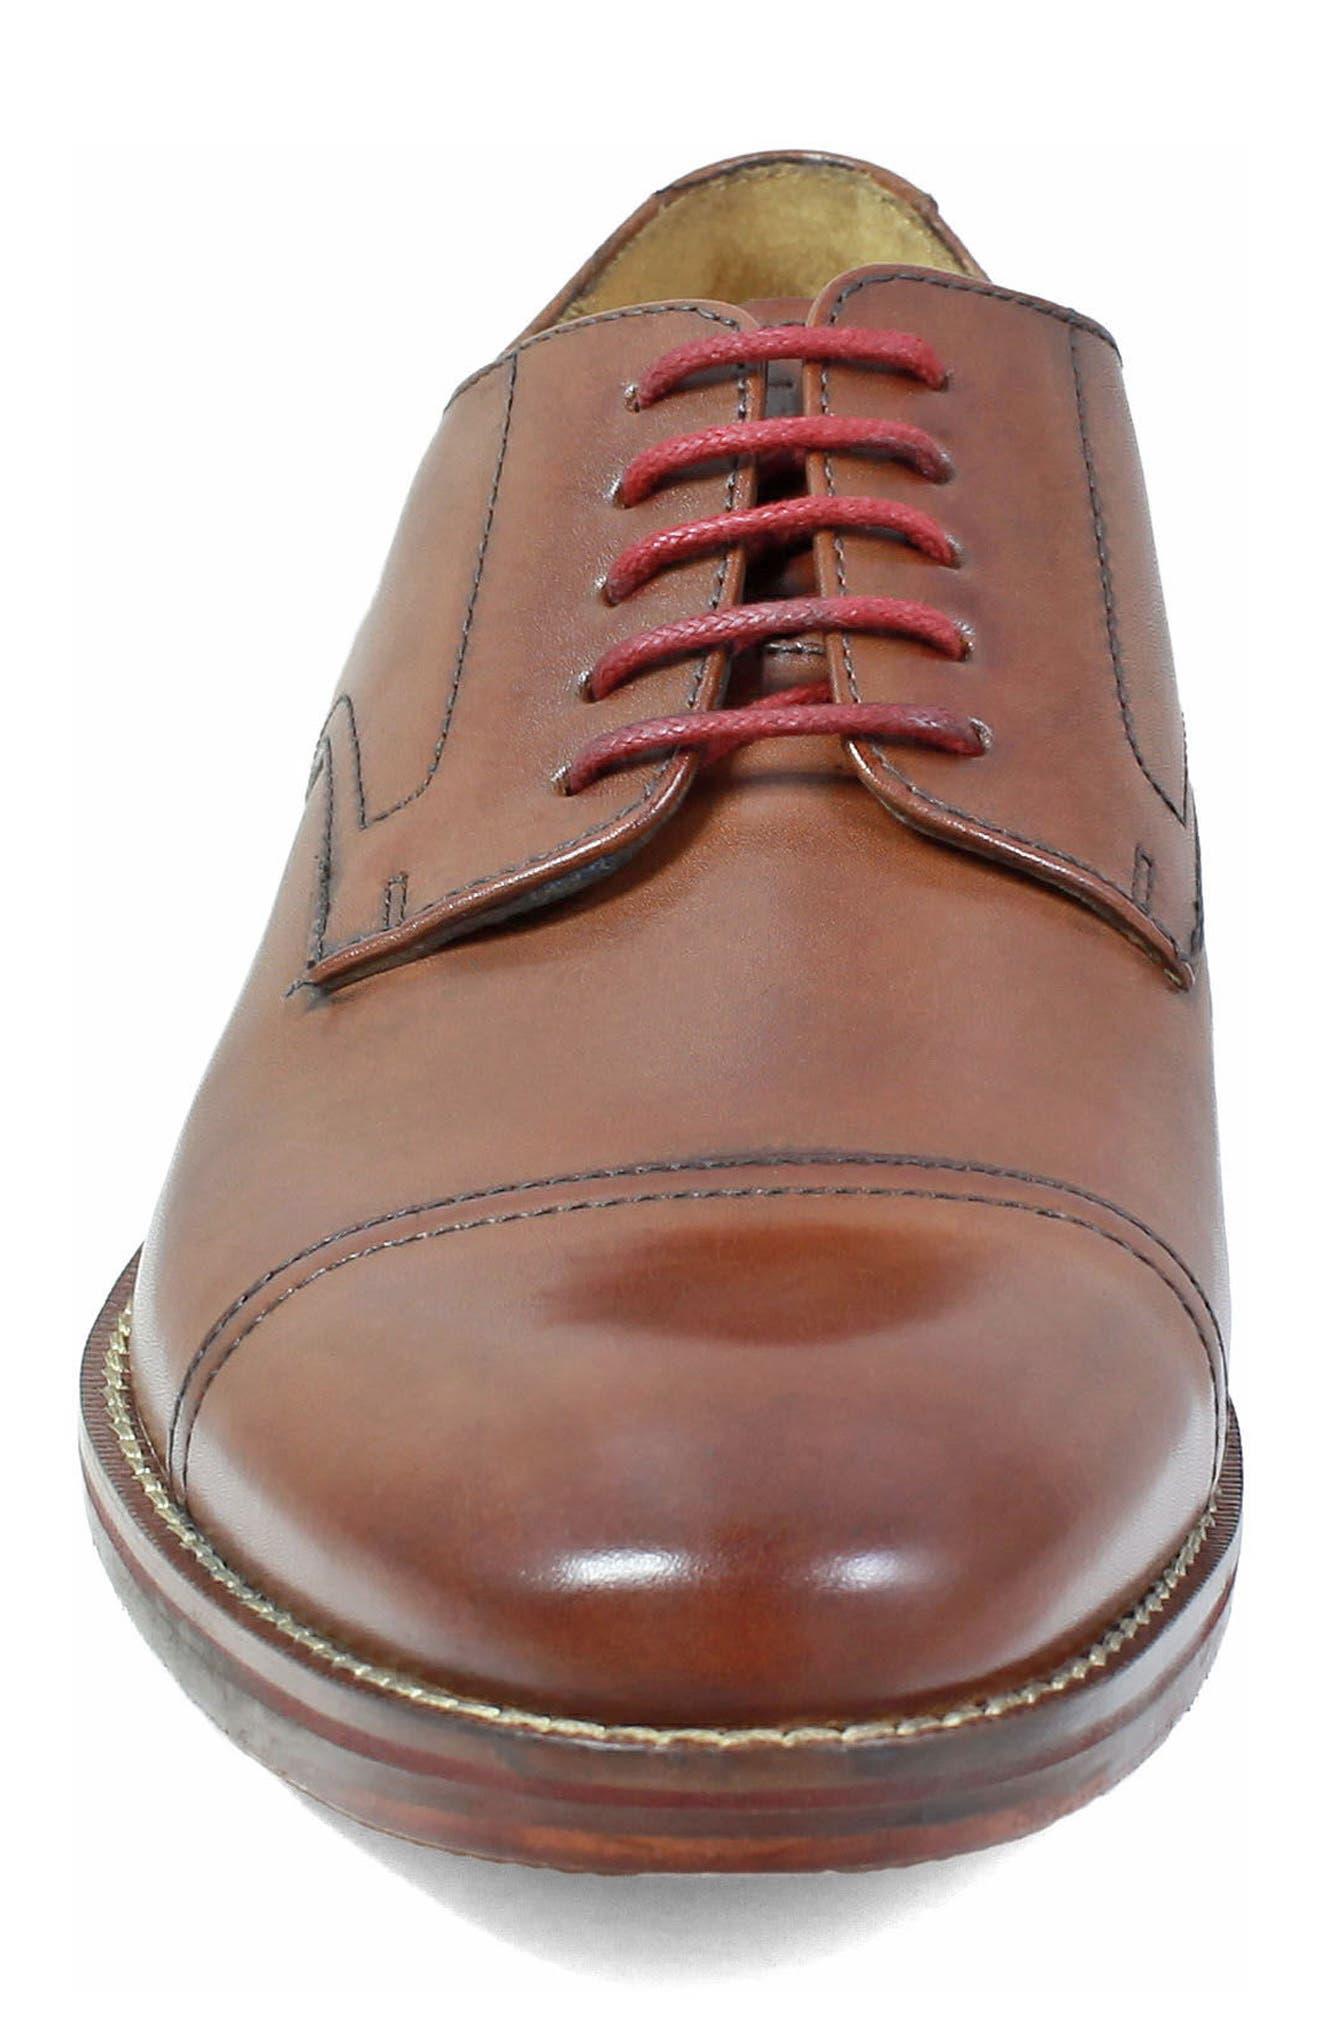 Salerno Wingtip,                             Alternate thumbnail 4, color,                             Cognac Leather